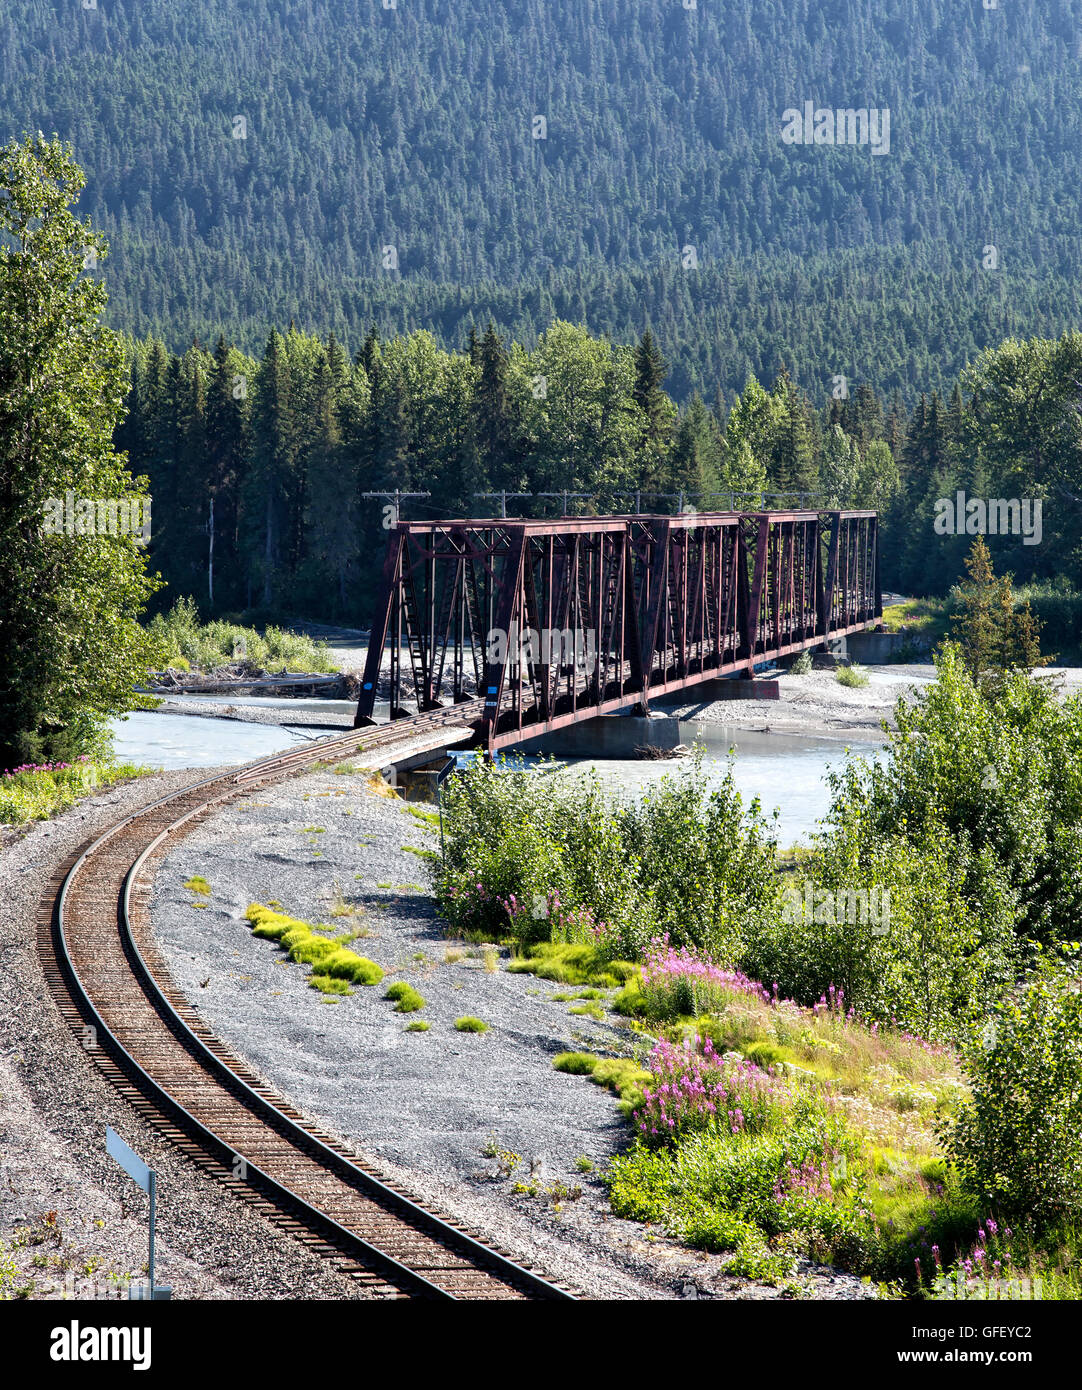 Railroad trestle crossing glacier-fed Snow river, Black Spruce forest. - Stock Image